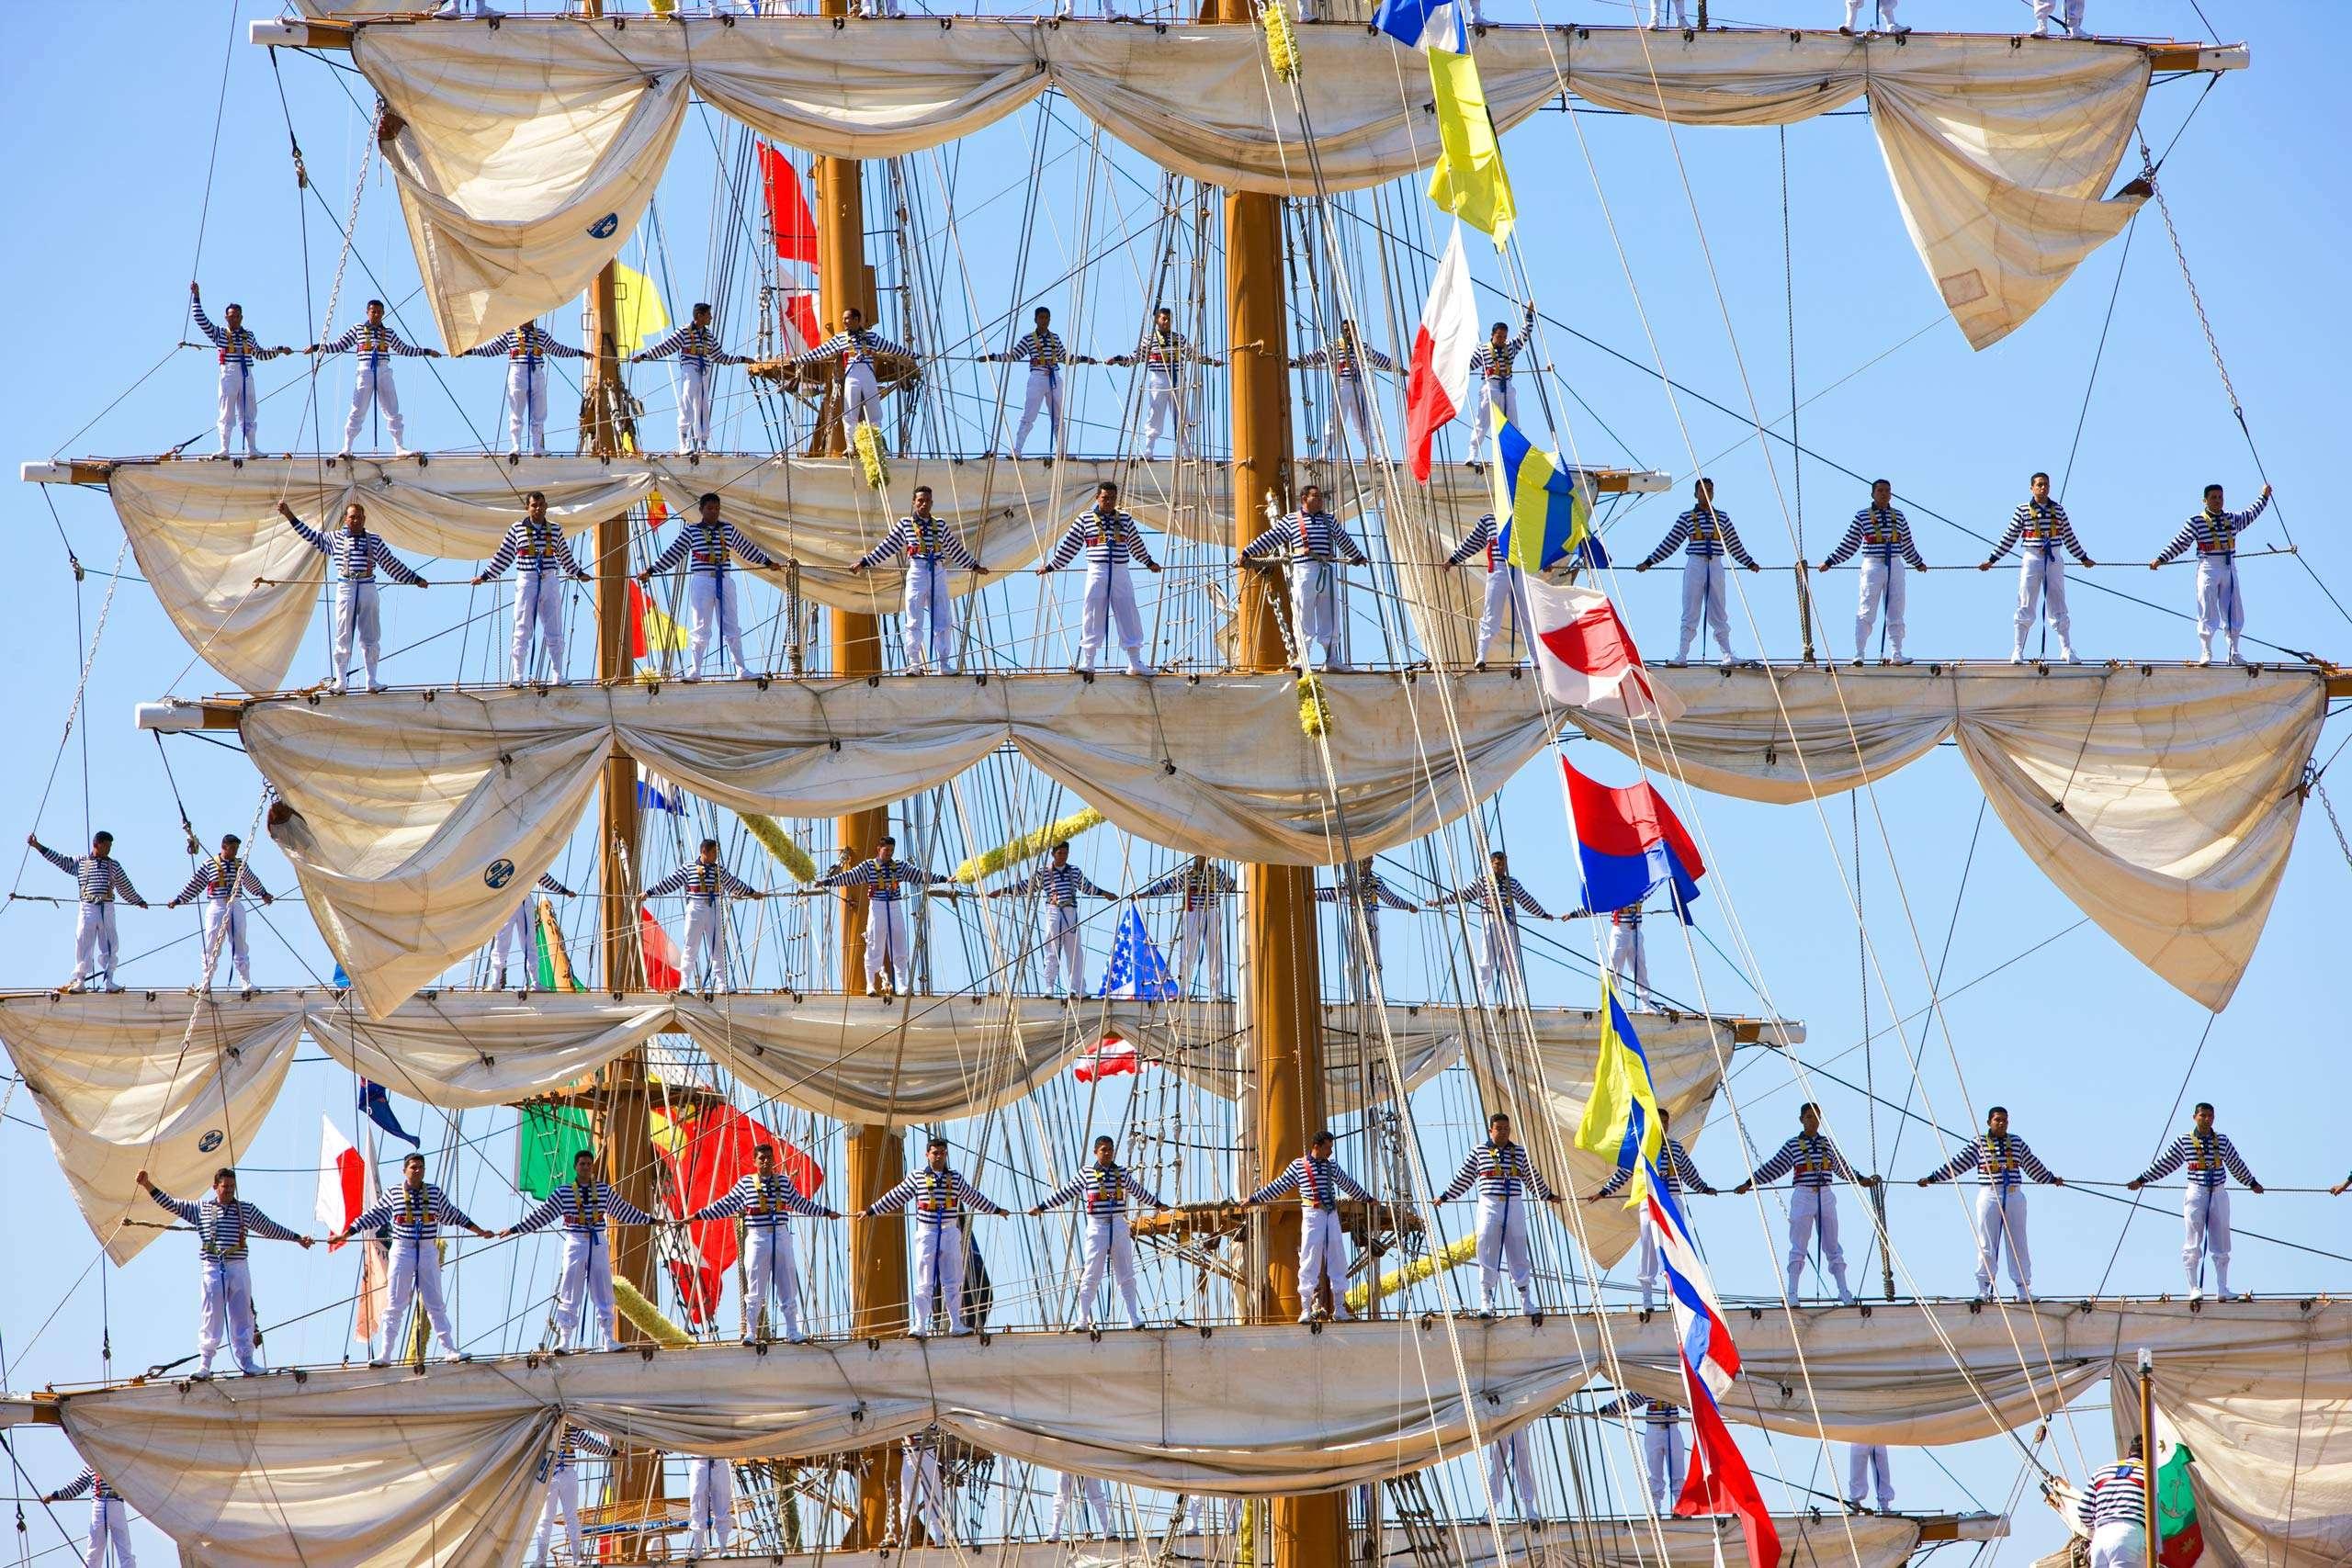 PORTFOLIO - Sailing - Tall Ships #20-PCG323